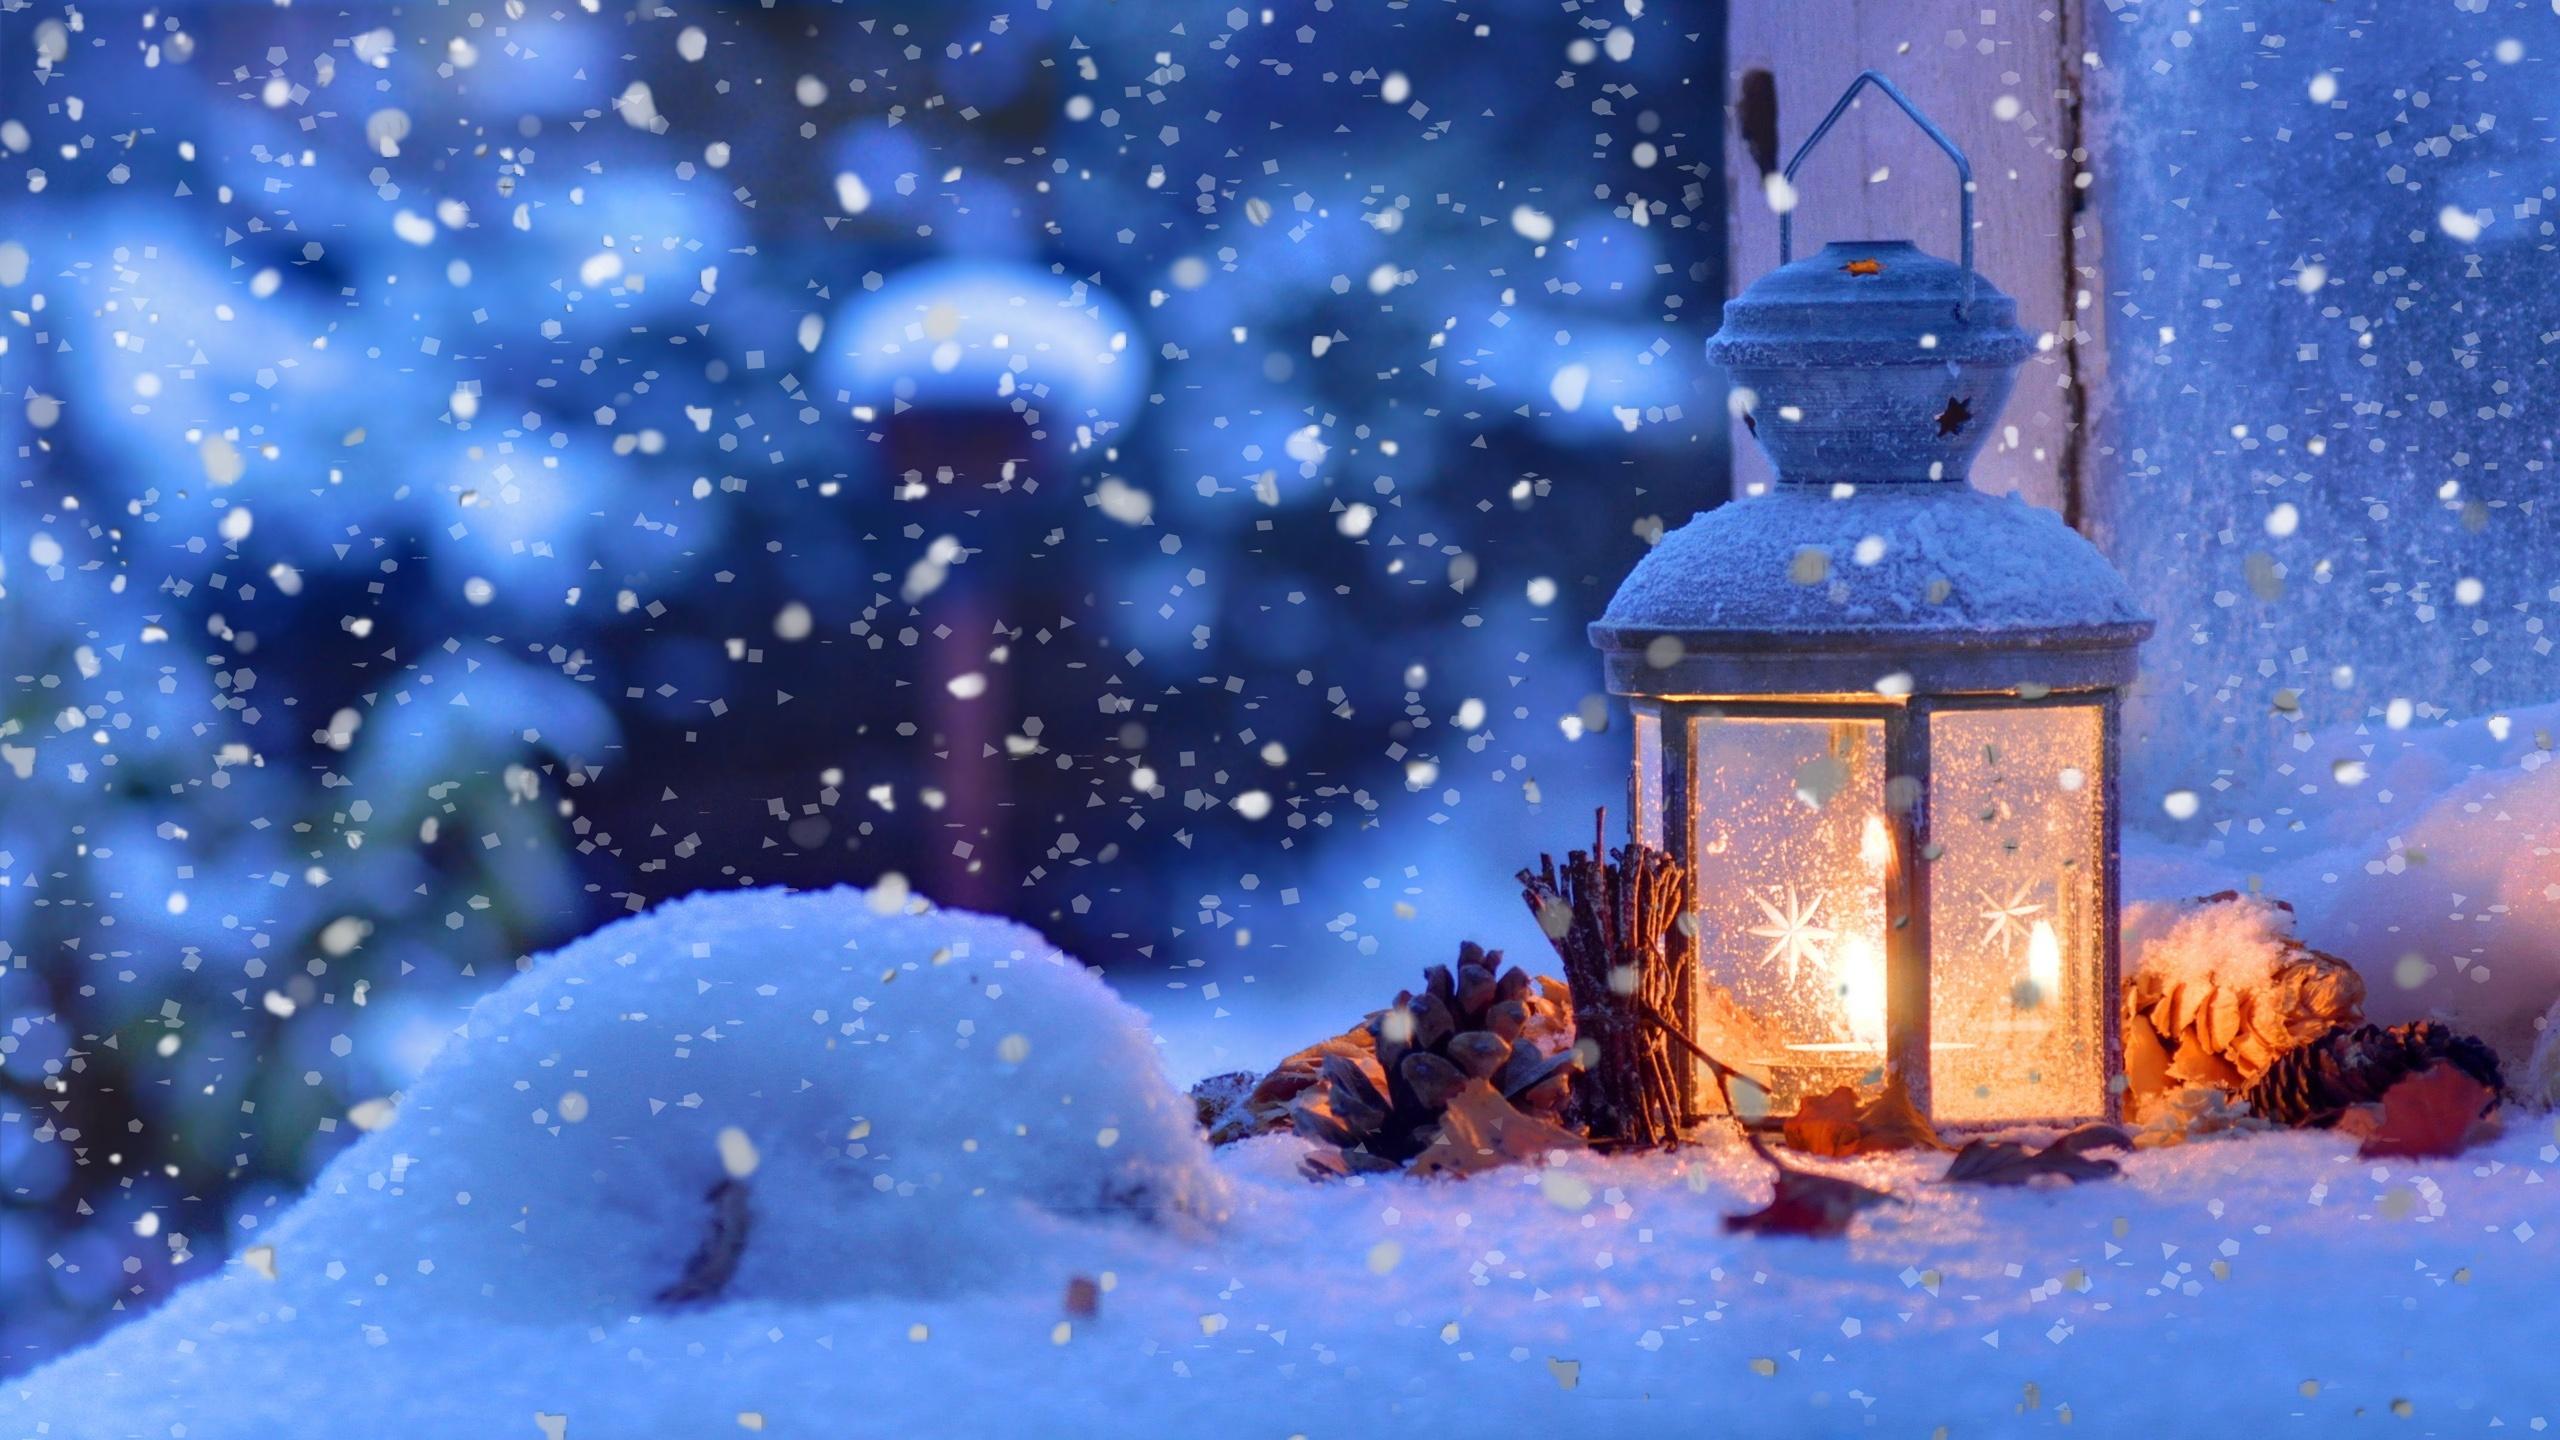 Christmas Snowflakes Winter Light Desktop Wallpaper